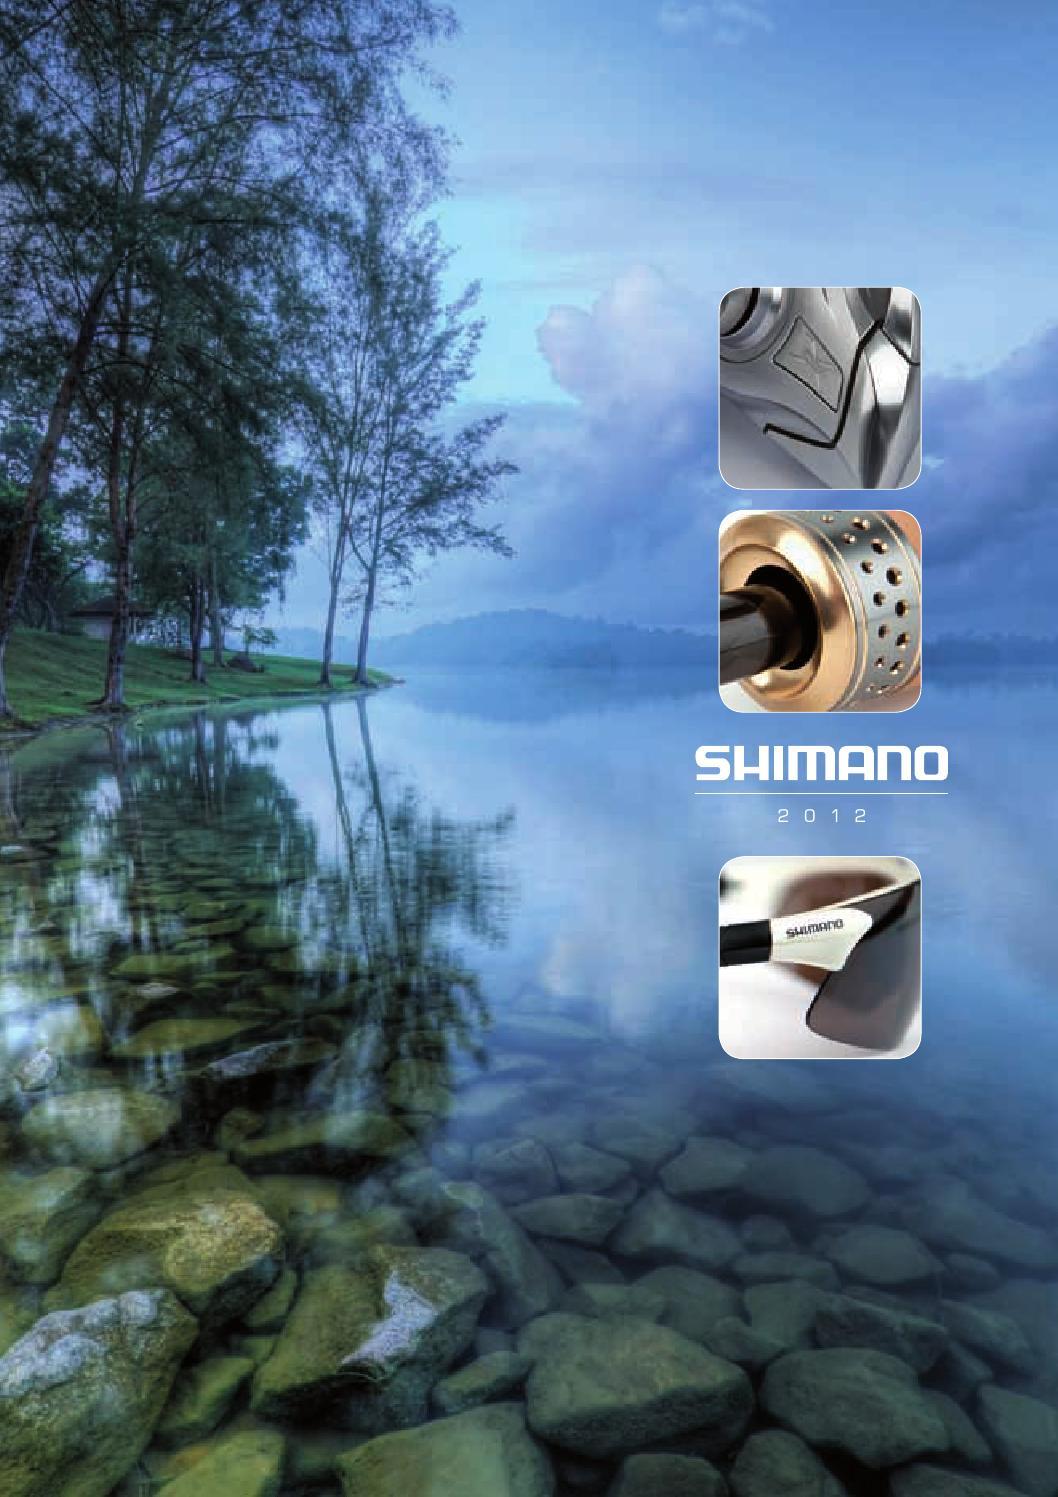 Shimano Vengeance CX Cork 1,80m 2,10m 2,40m 2,70m 3,00m 3-15g 3-21g 10-35g etc.